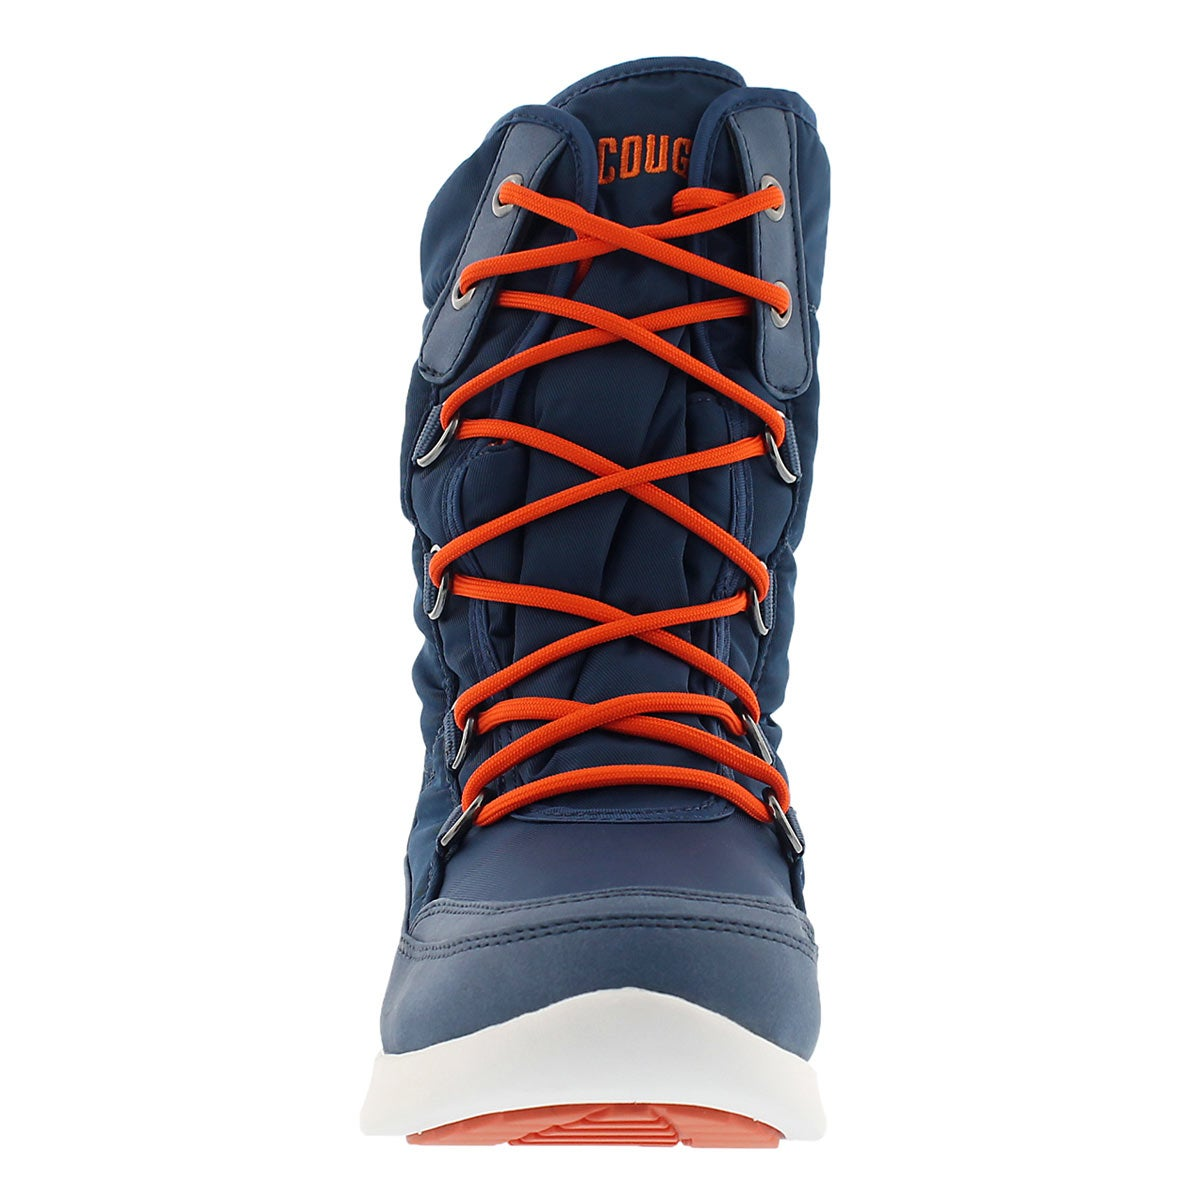 Lds Wagu blue wtpf lace up winter boot